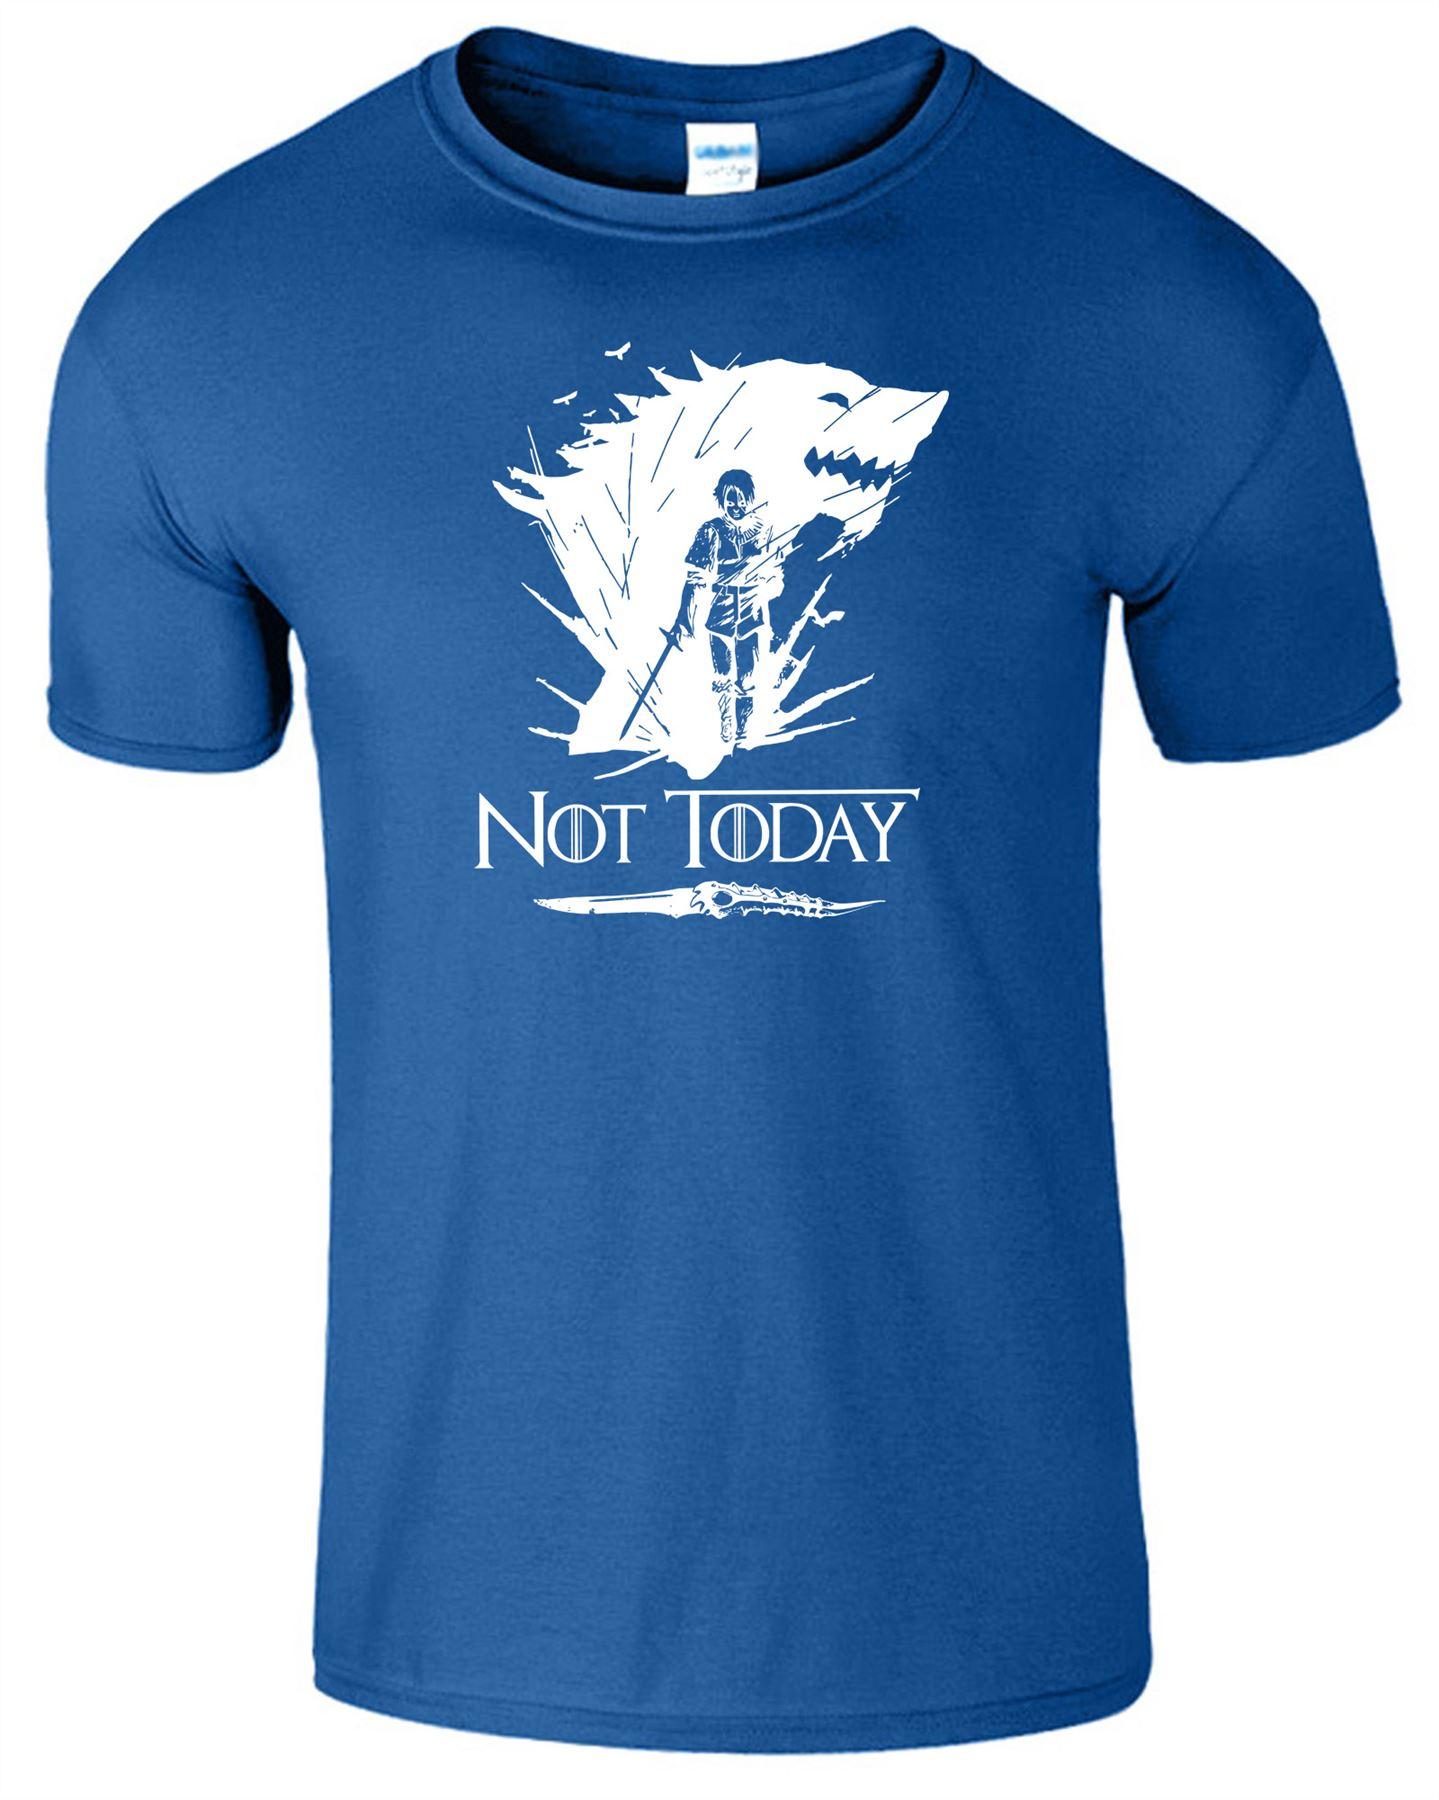 Arya-Stark-Not-Today-T-Shirt-Mens-Game-Season-Womens-Shirt-Adults-Unisex-Fit Indexbild 41